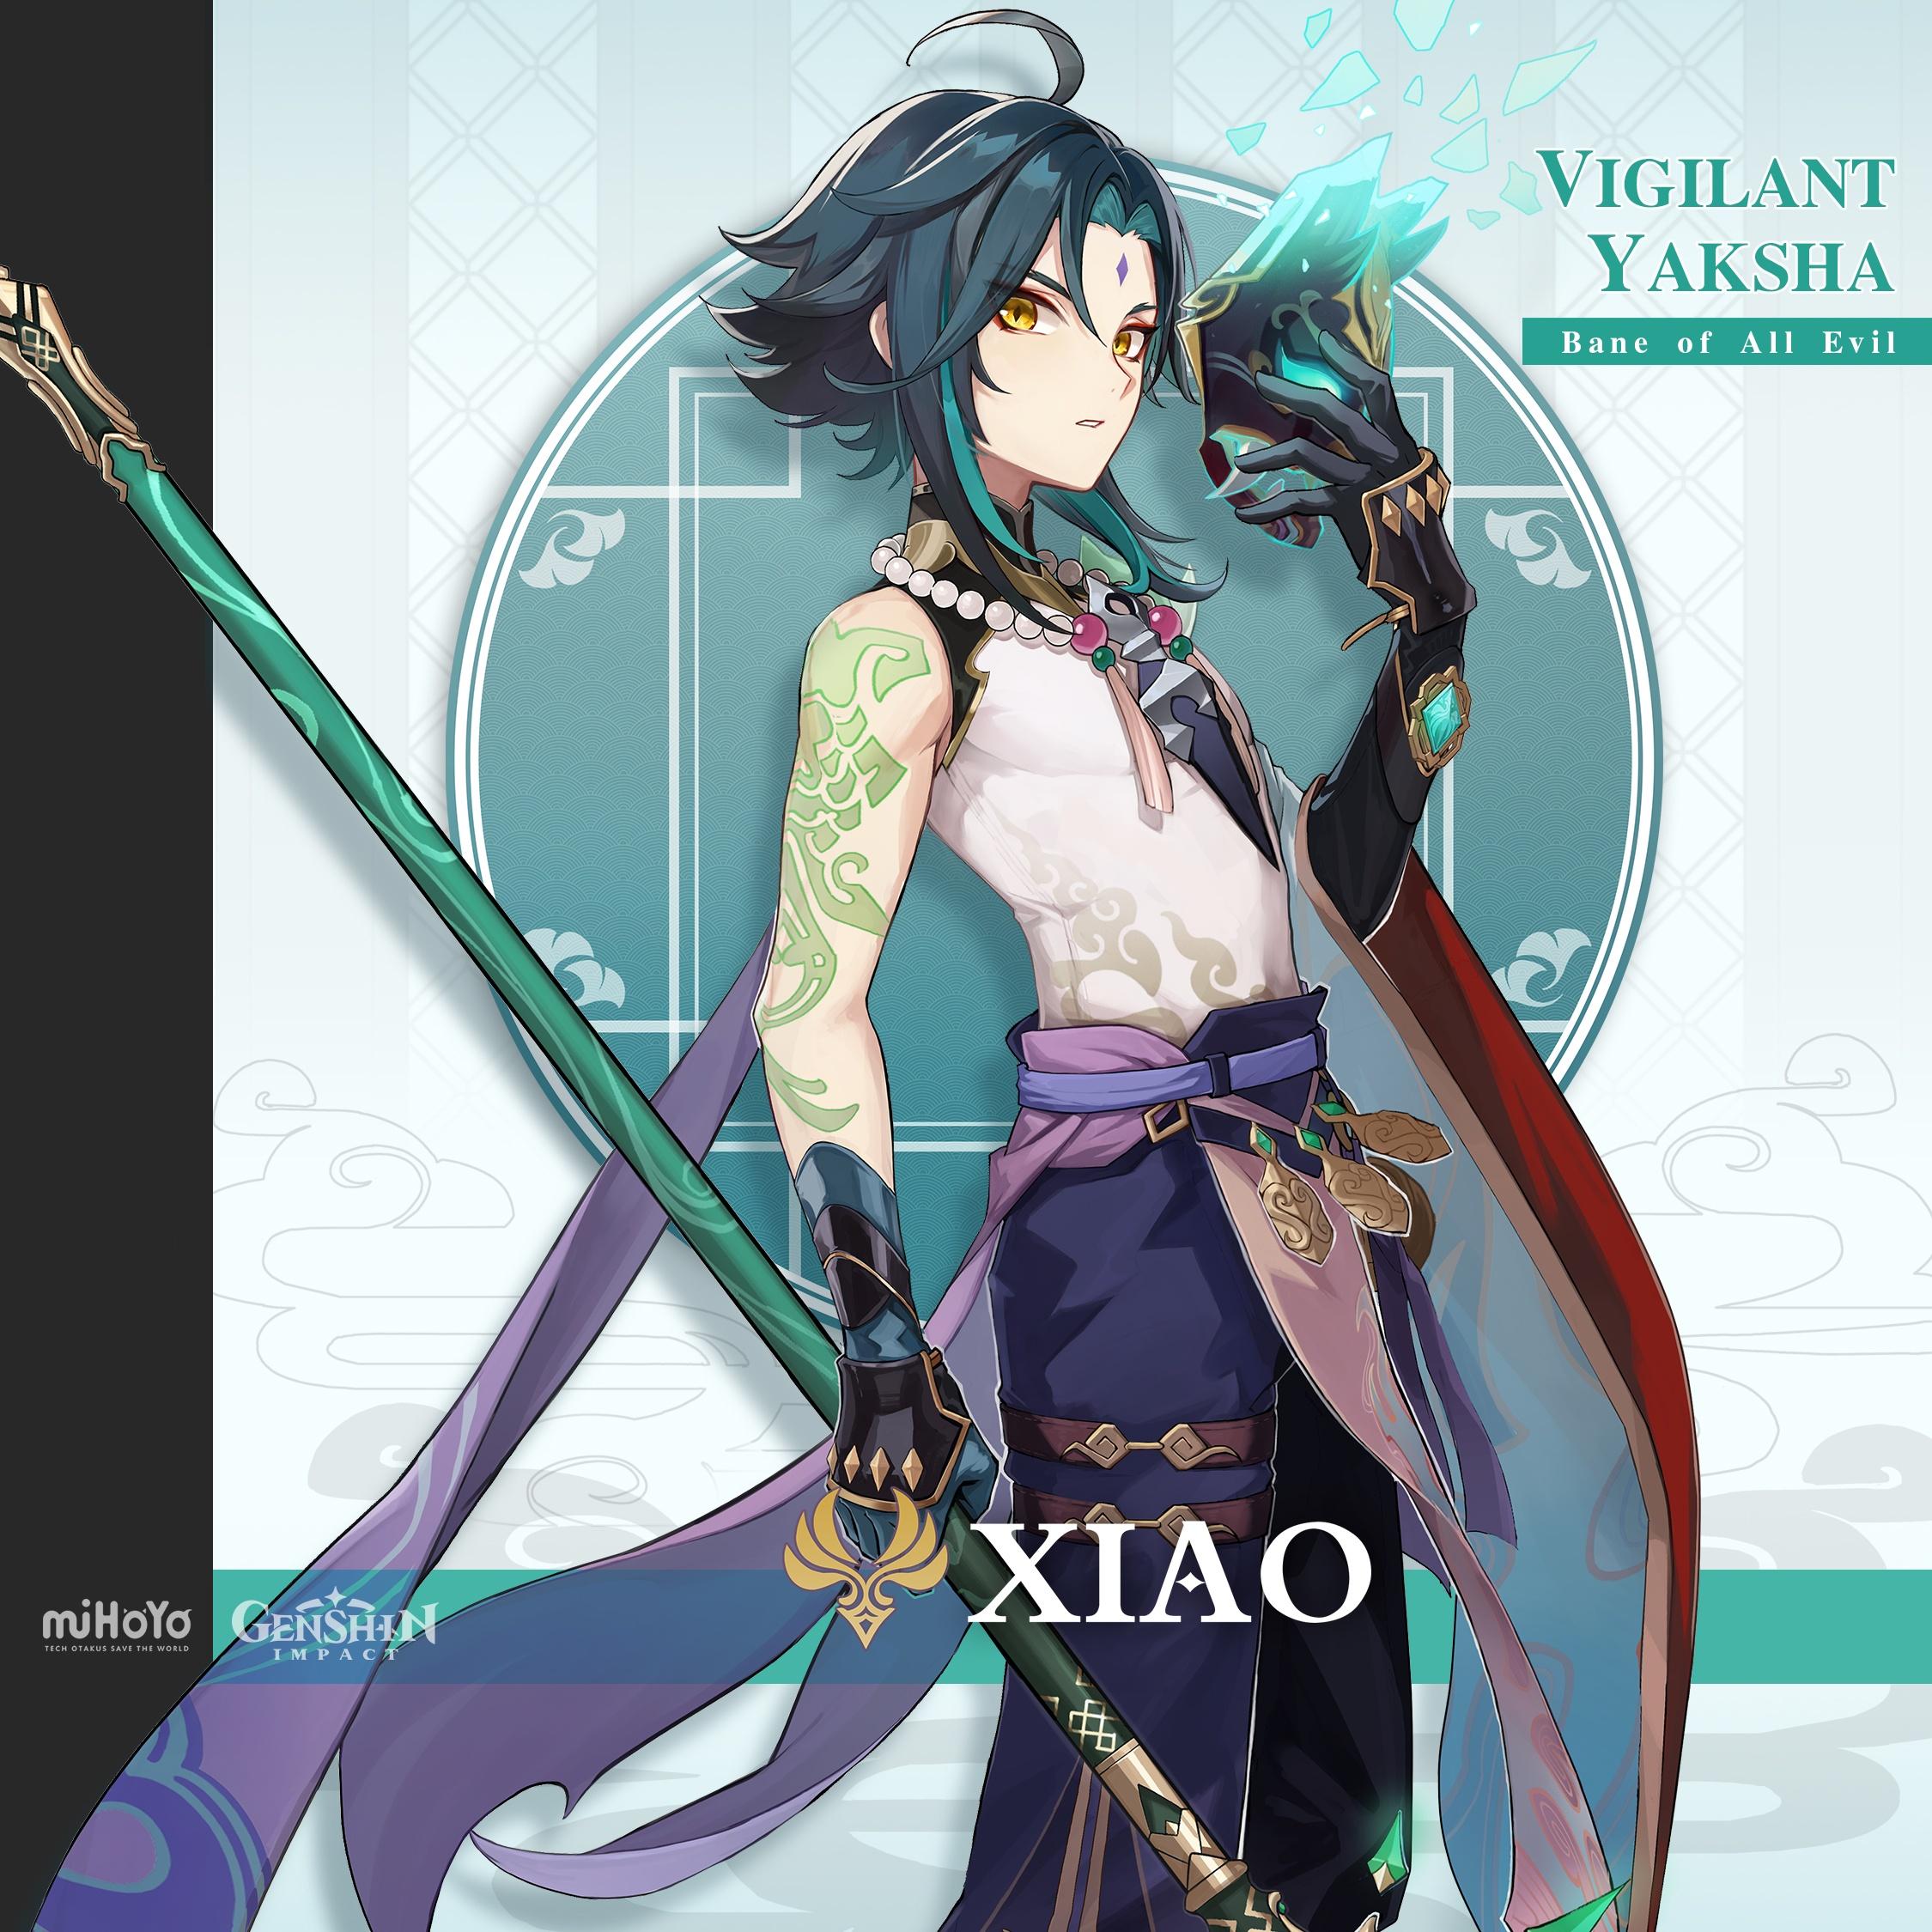 Genshin Impact 1.3 Update – Overview of Xiao, the Vigilant Yaksha